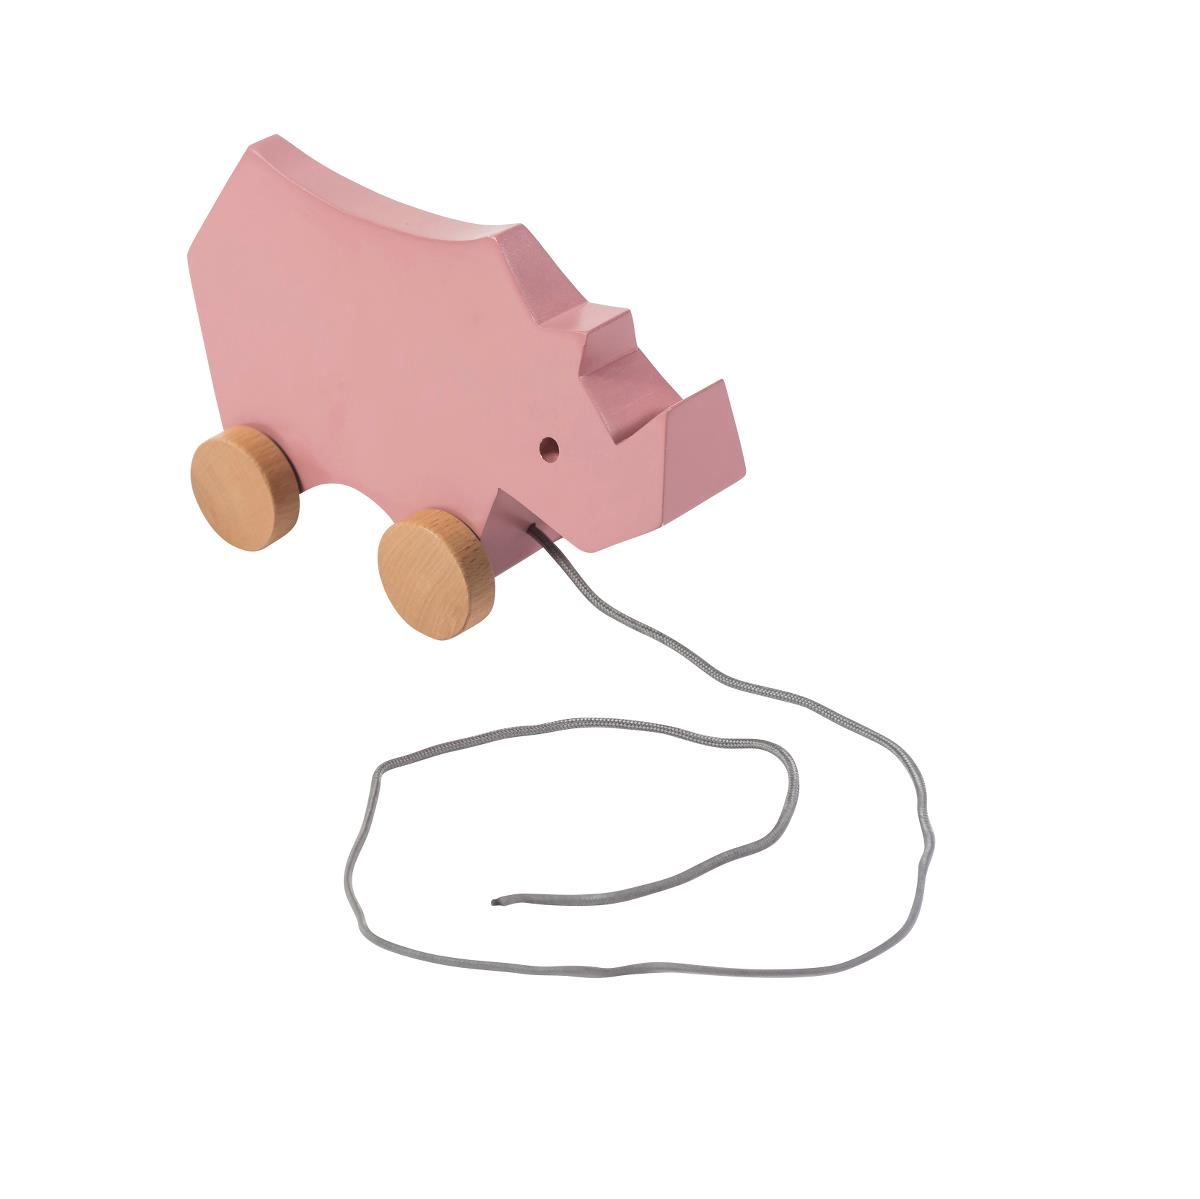 sebra Nachziehspielzeug aus Holz, Nashorn, altrosa 3017203 - 01